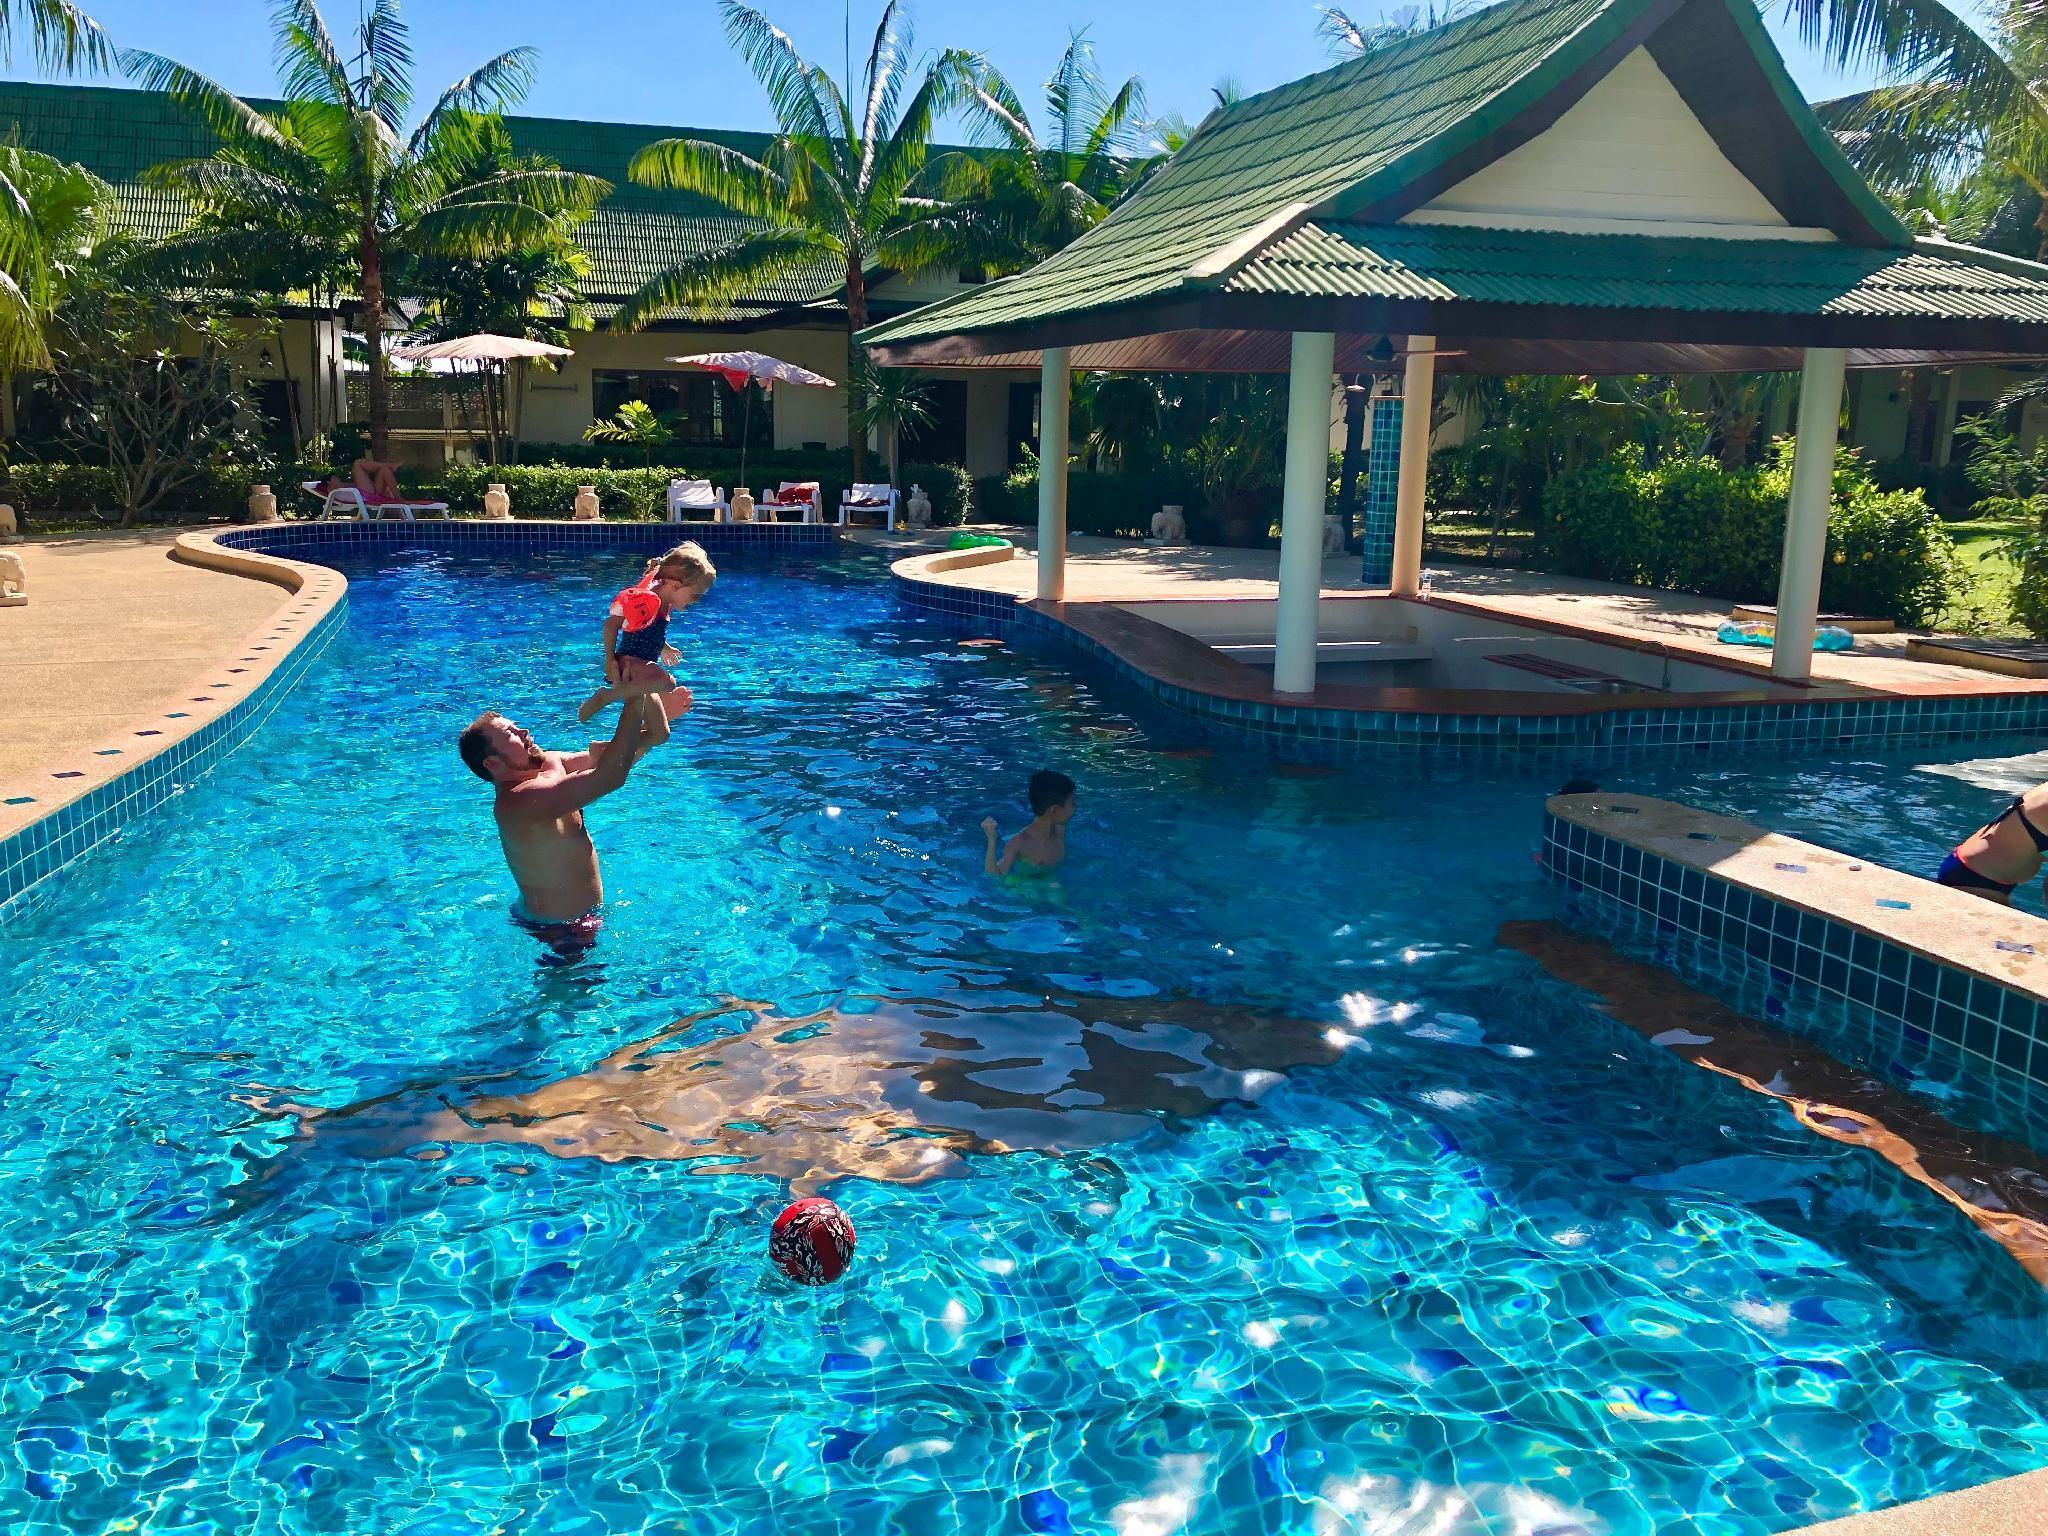 Chalong Oasis Resort & Spa ฉลอง โอเอซิส รีสอร์ต แอนด์ สปา